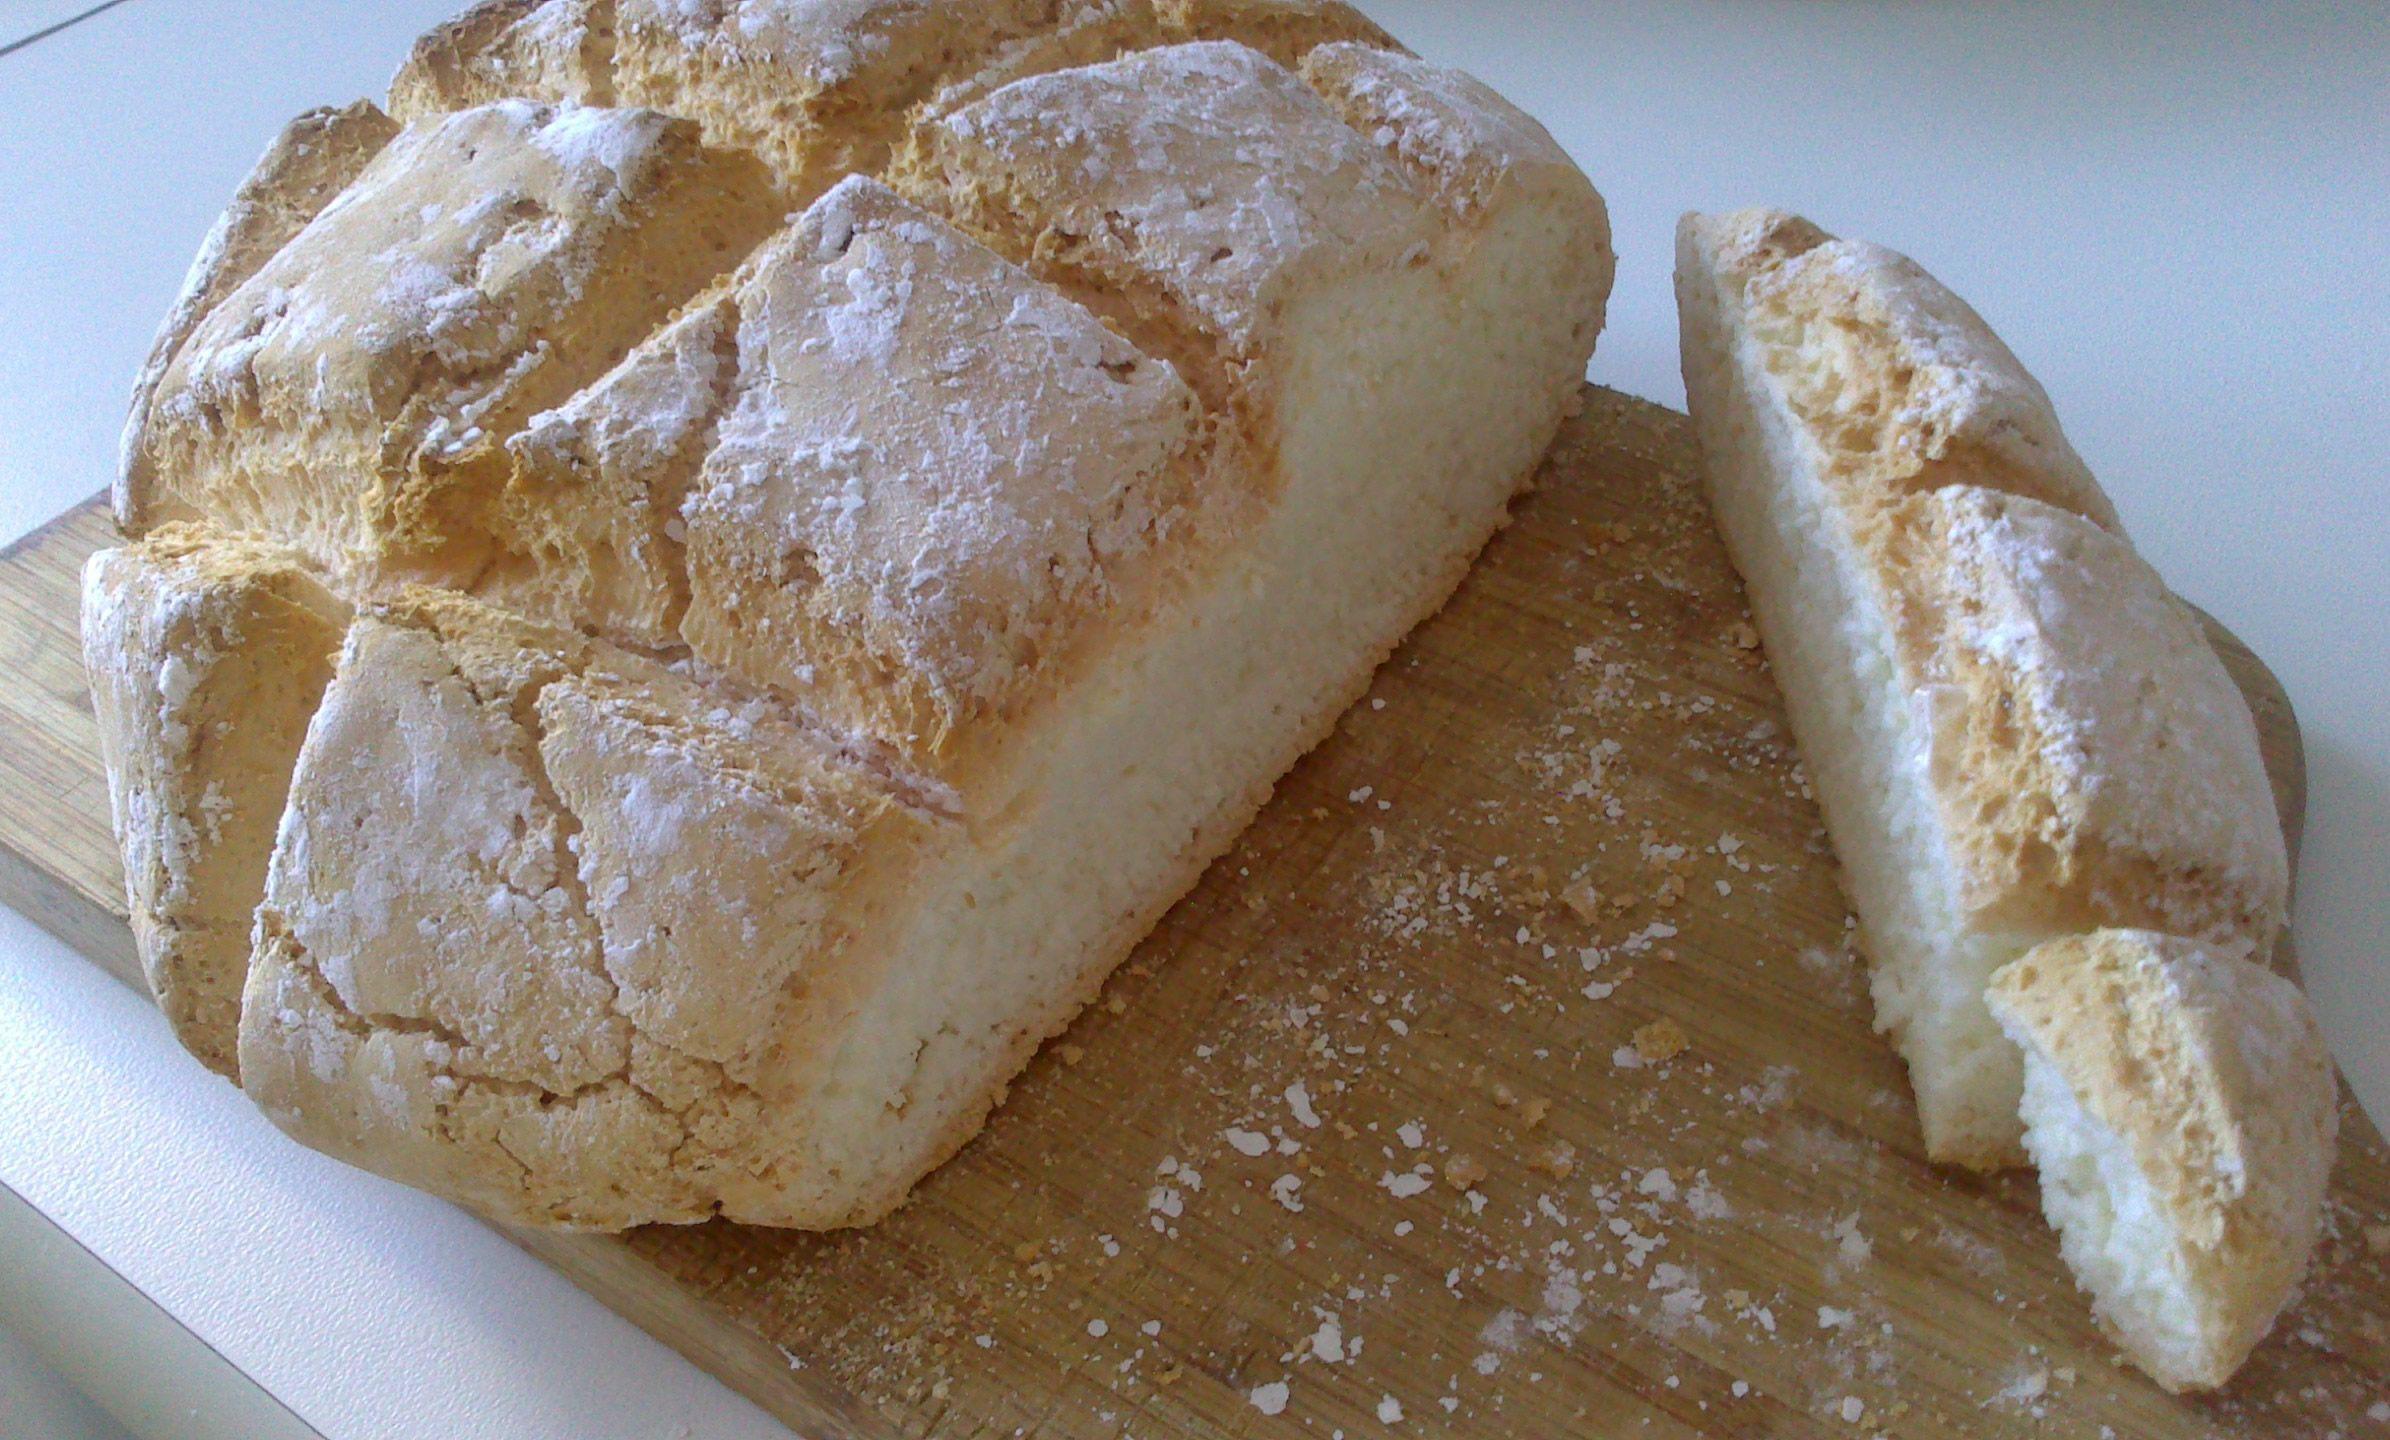 Pan Rápido Sin Gluten Con Thermomix Recetas Para Cocinar Comida Para Celiacos Sin Gluten